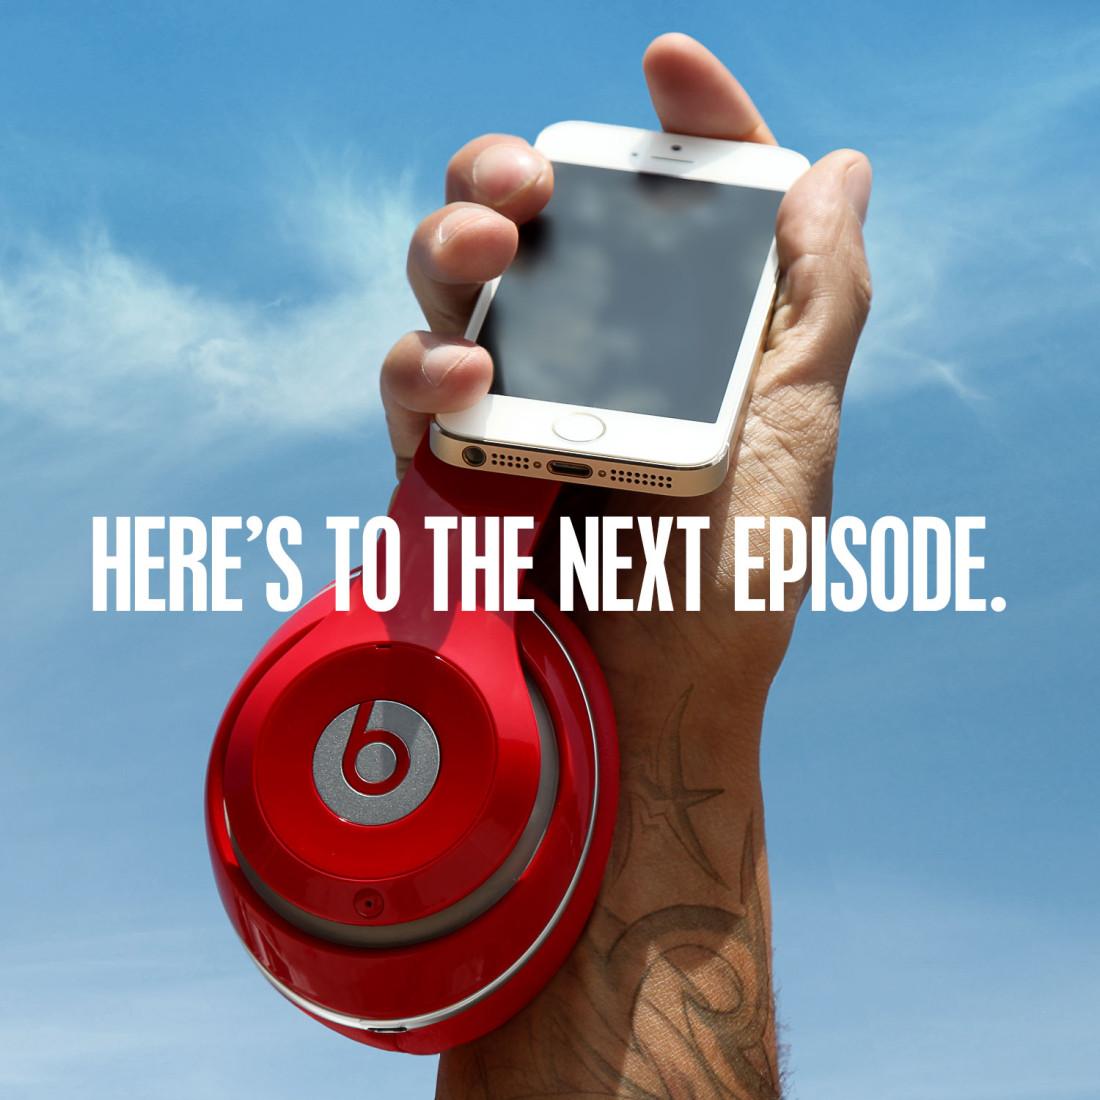 Beats adquirida pela Apple